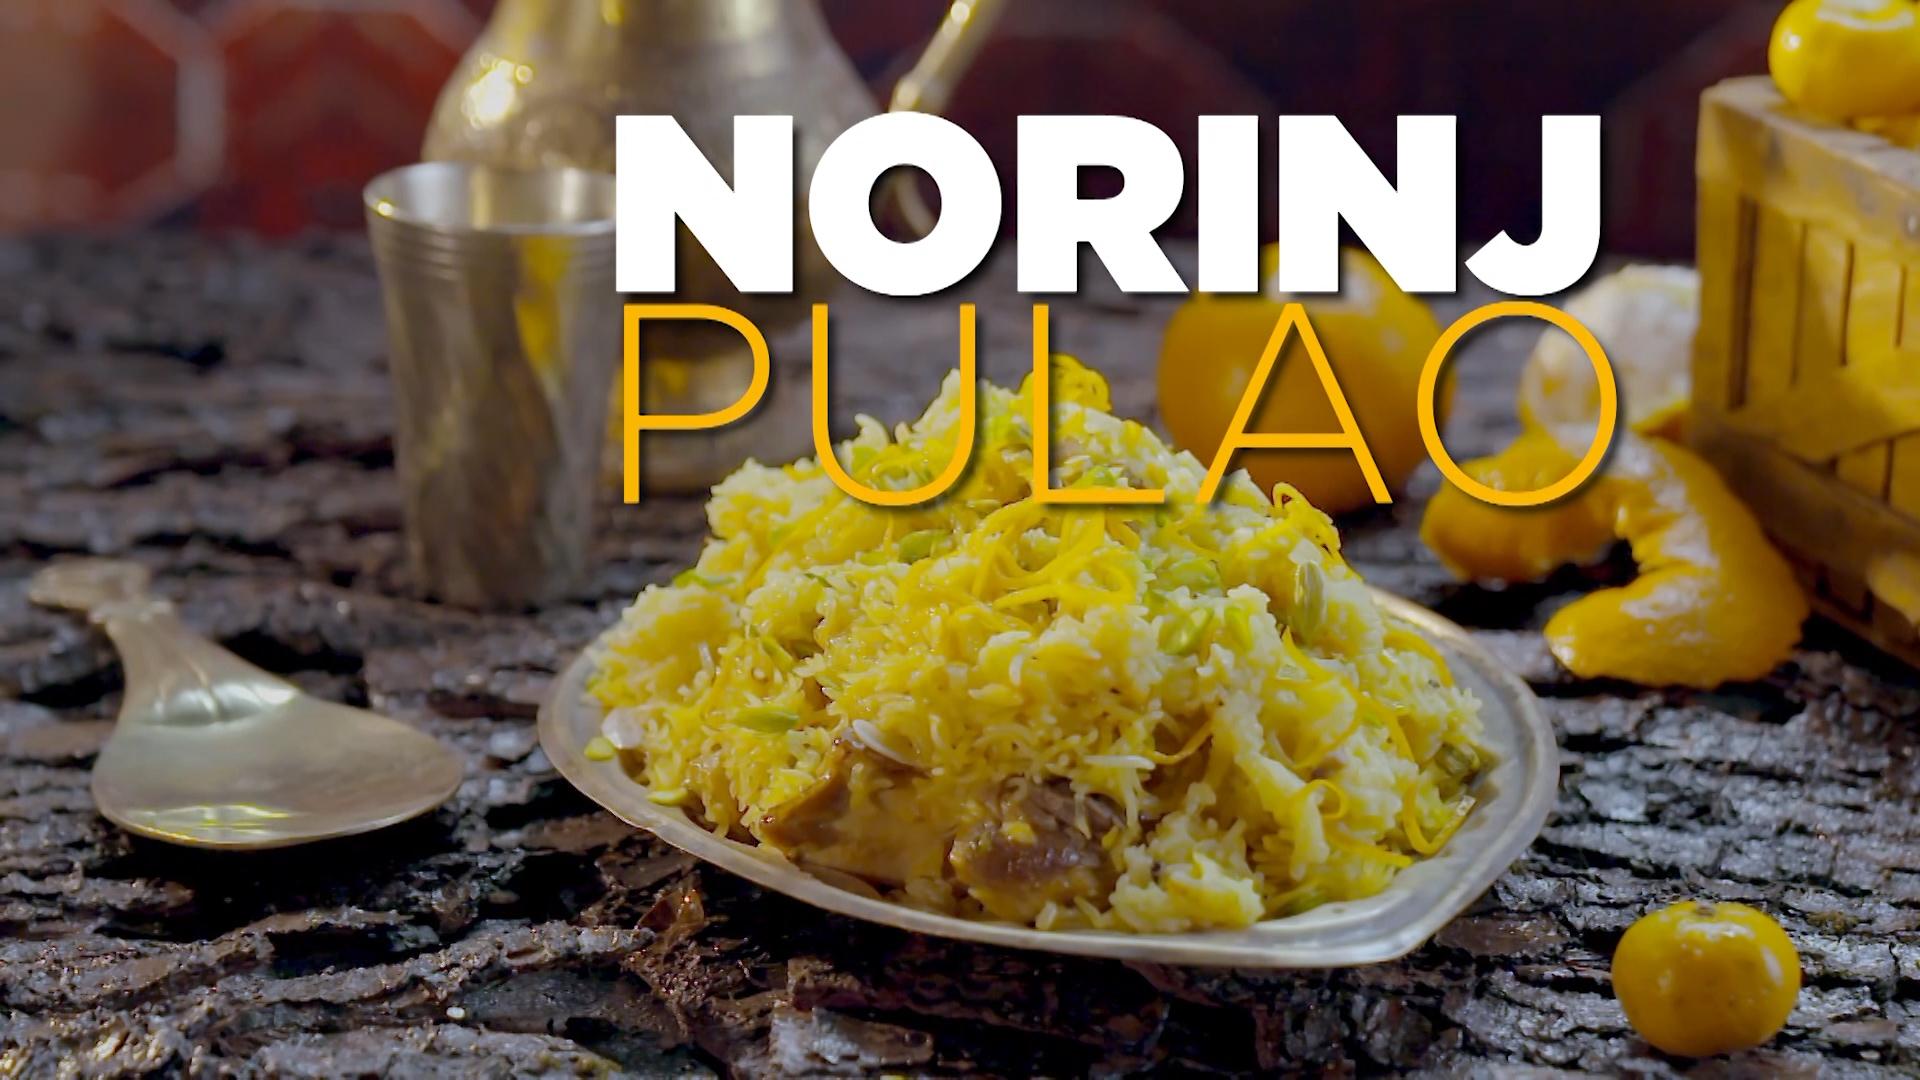 Norinj Pulao